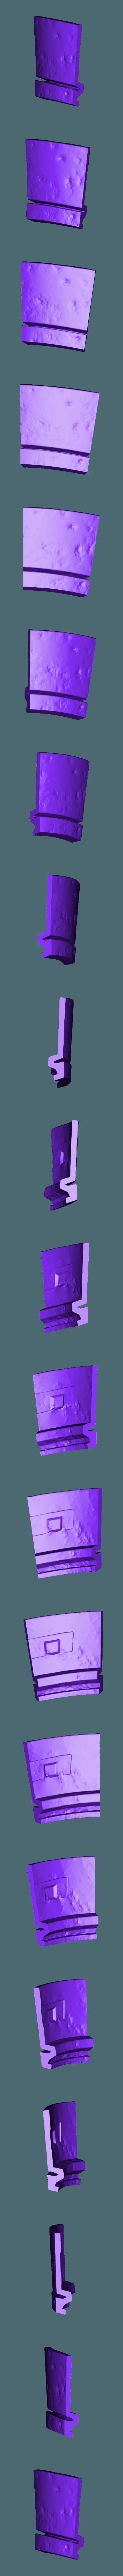 Armory_Damaged_Print7.stl Download OBJ file Armory - Knights of Ren Helmet (damaged), 3D print model • 3D print design, 3D-mon